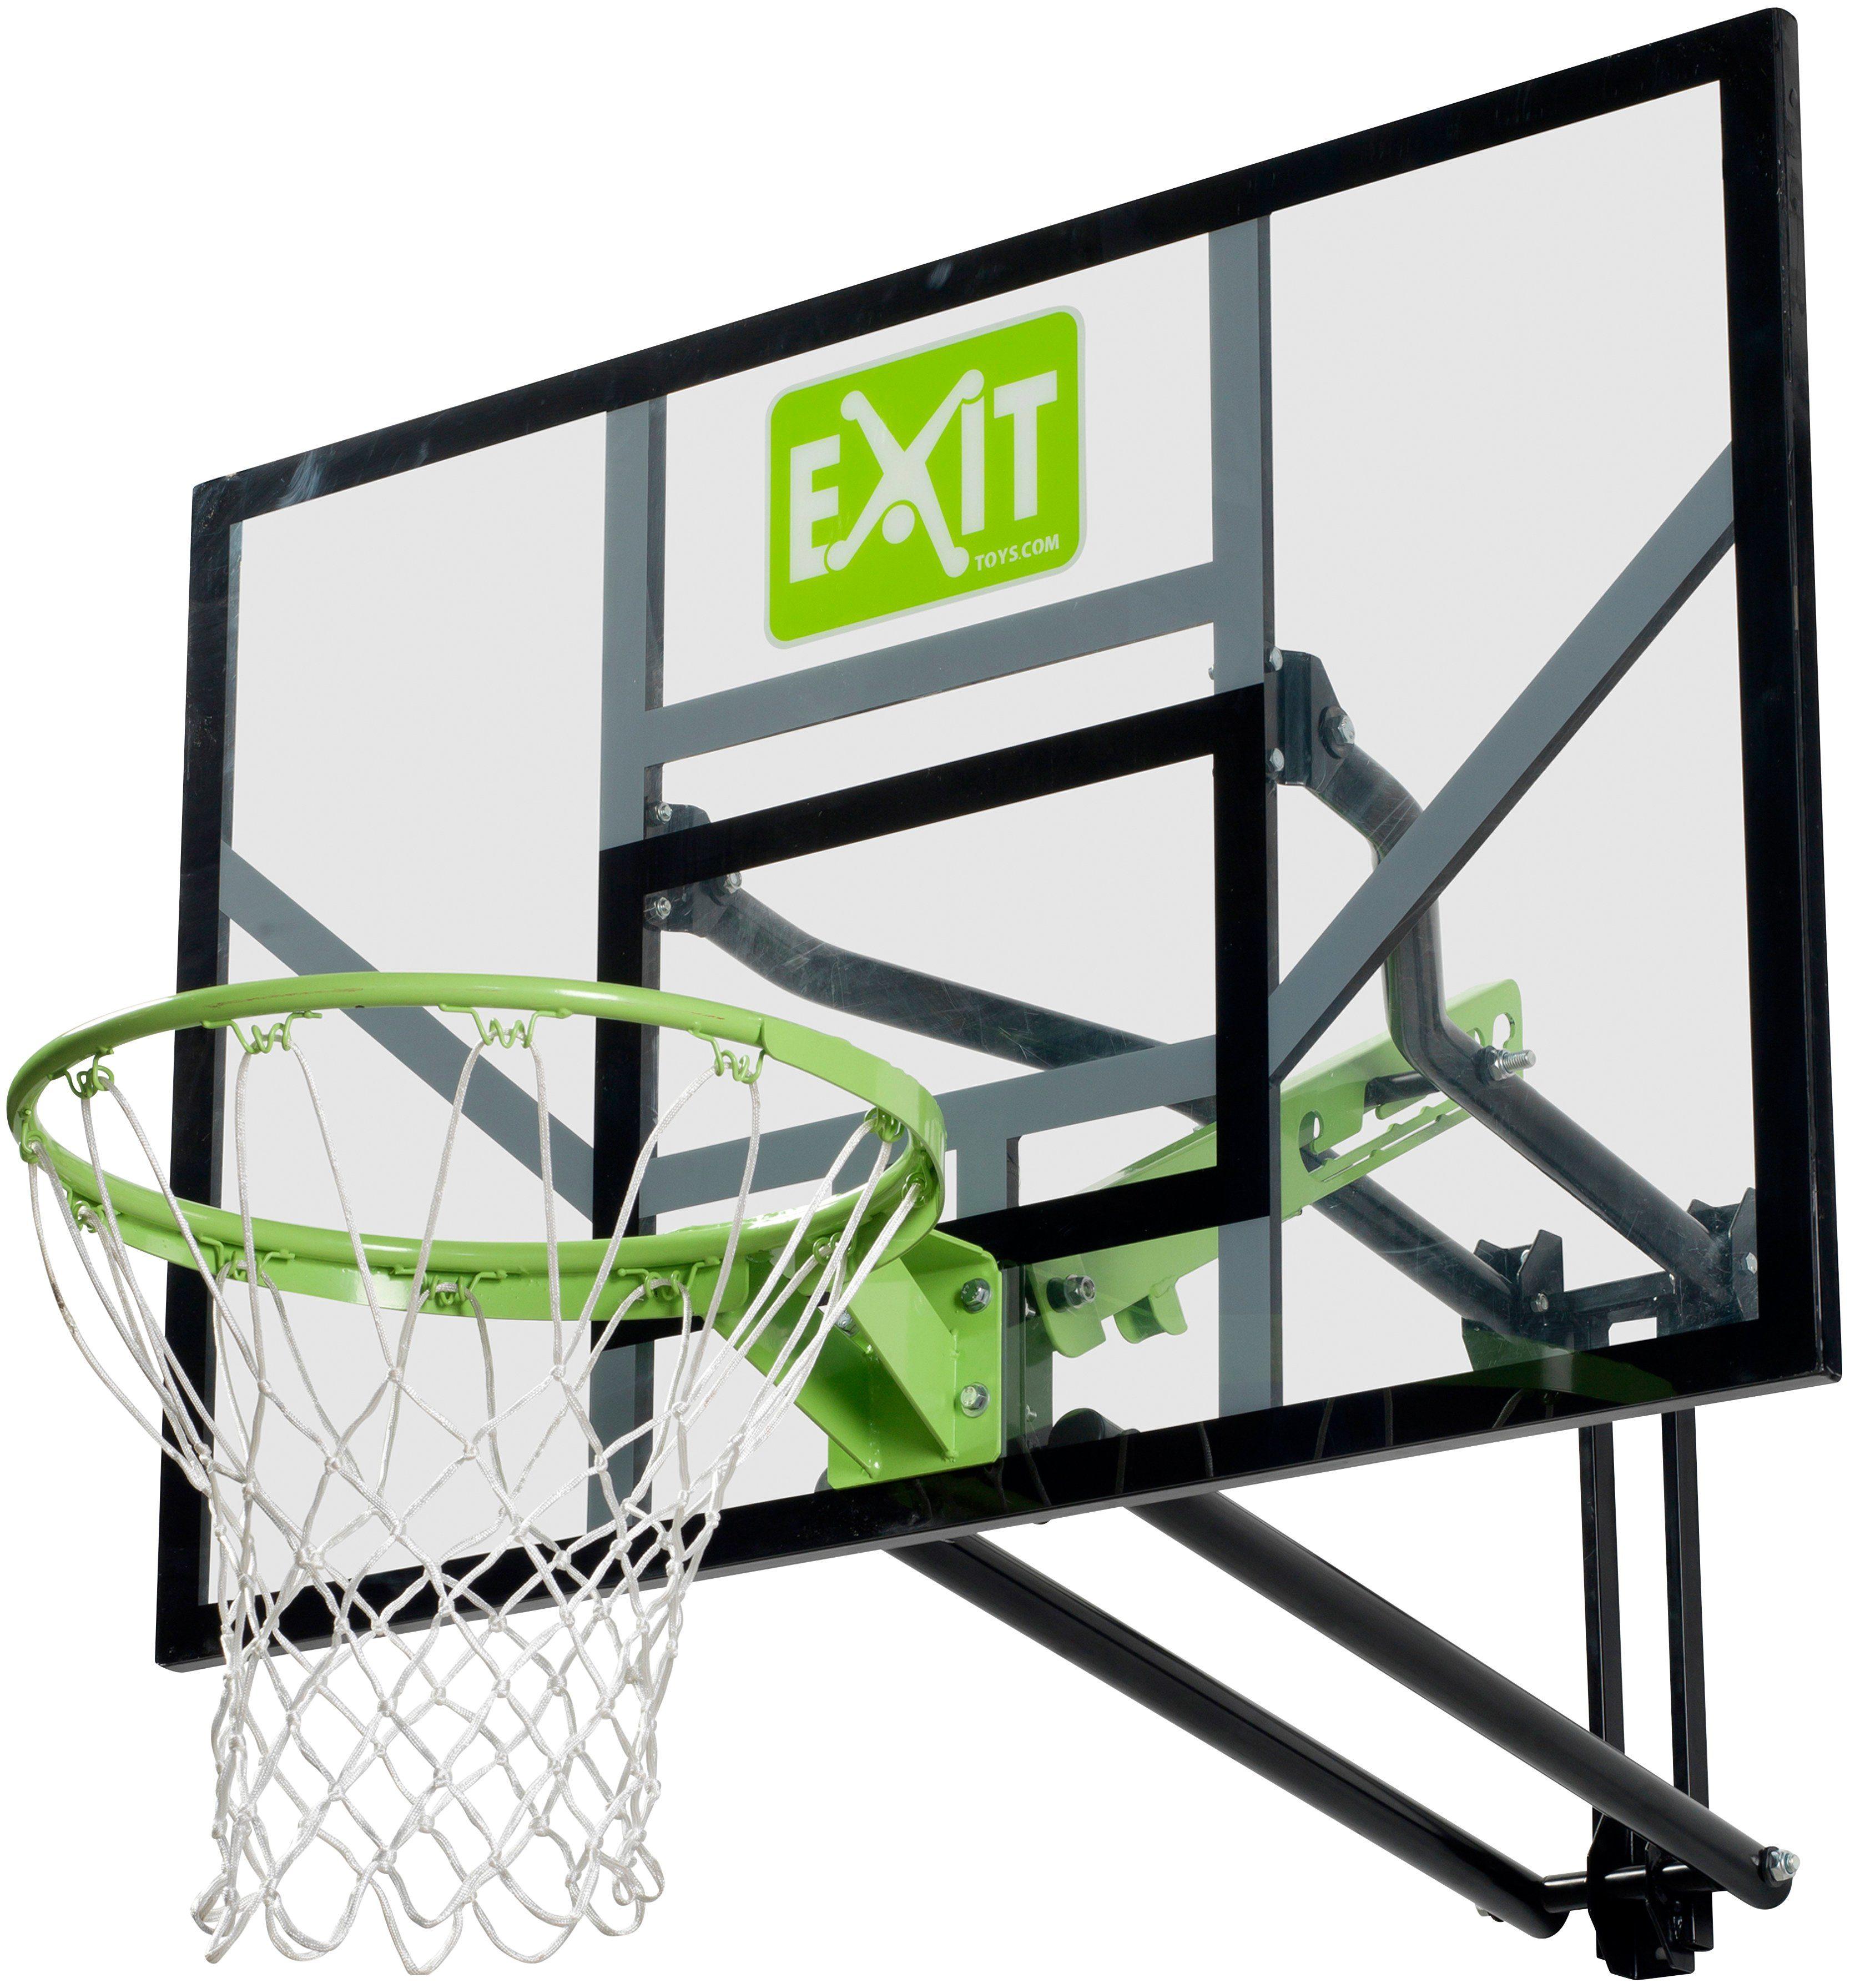 EXIT Basketballkorb »GALAXY Wall-mount«, in 5 Höhen einstellbar